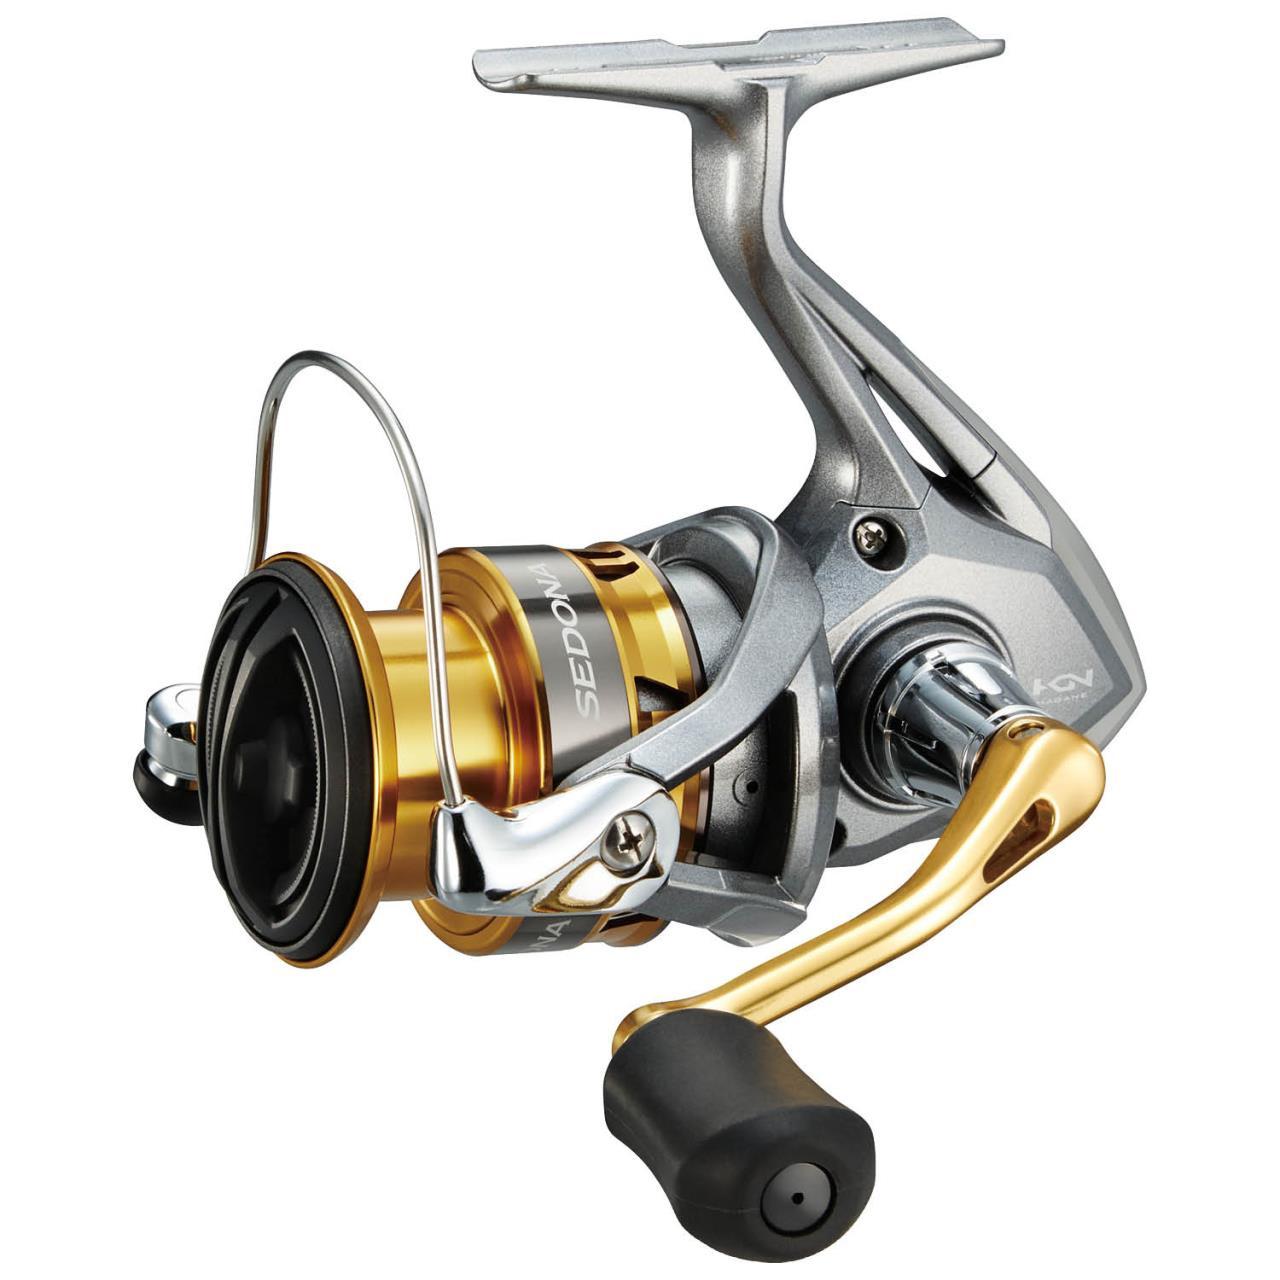 Shimano Sedona FI Spin Reel - 022255211178